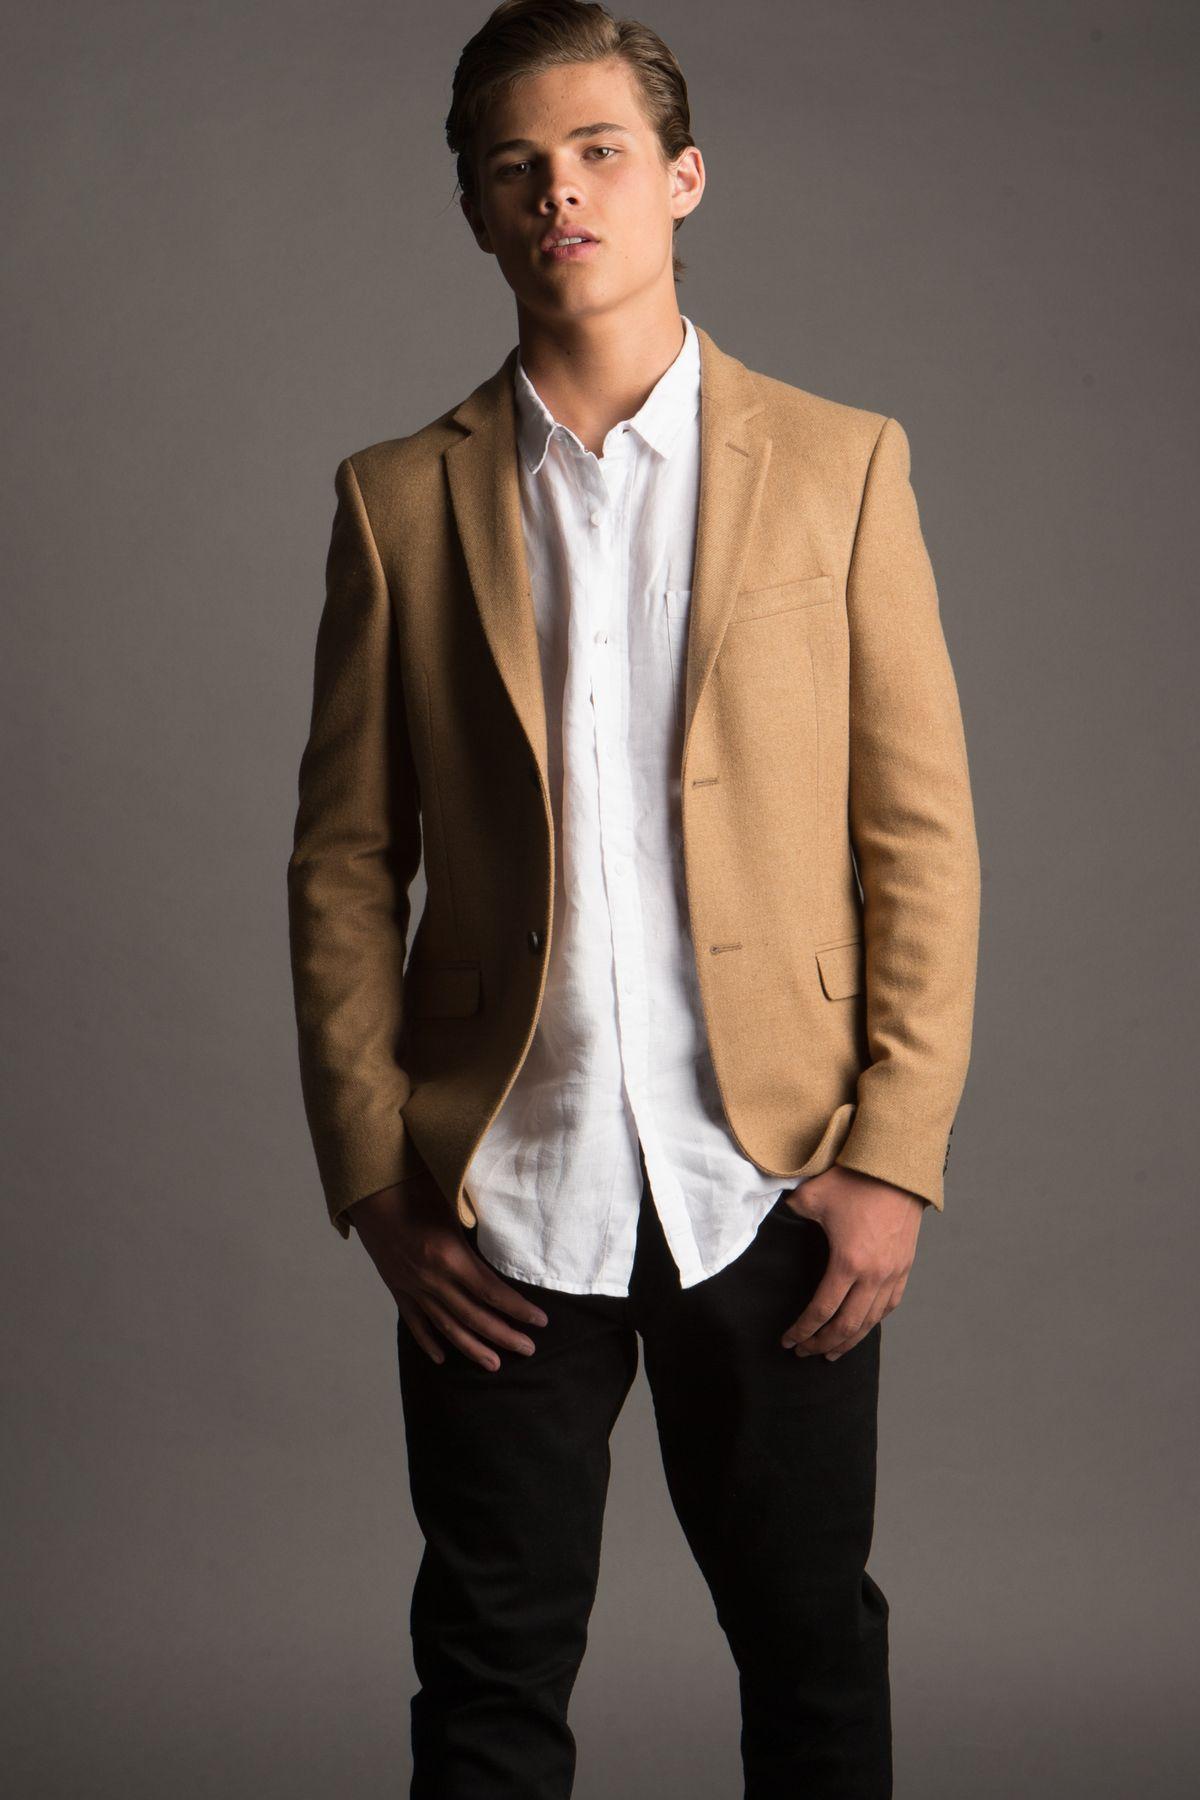 Model Ben Murken